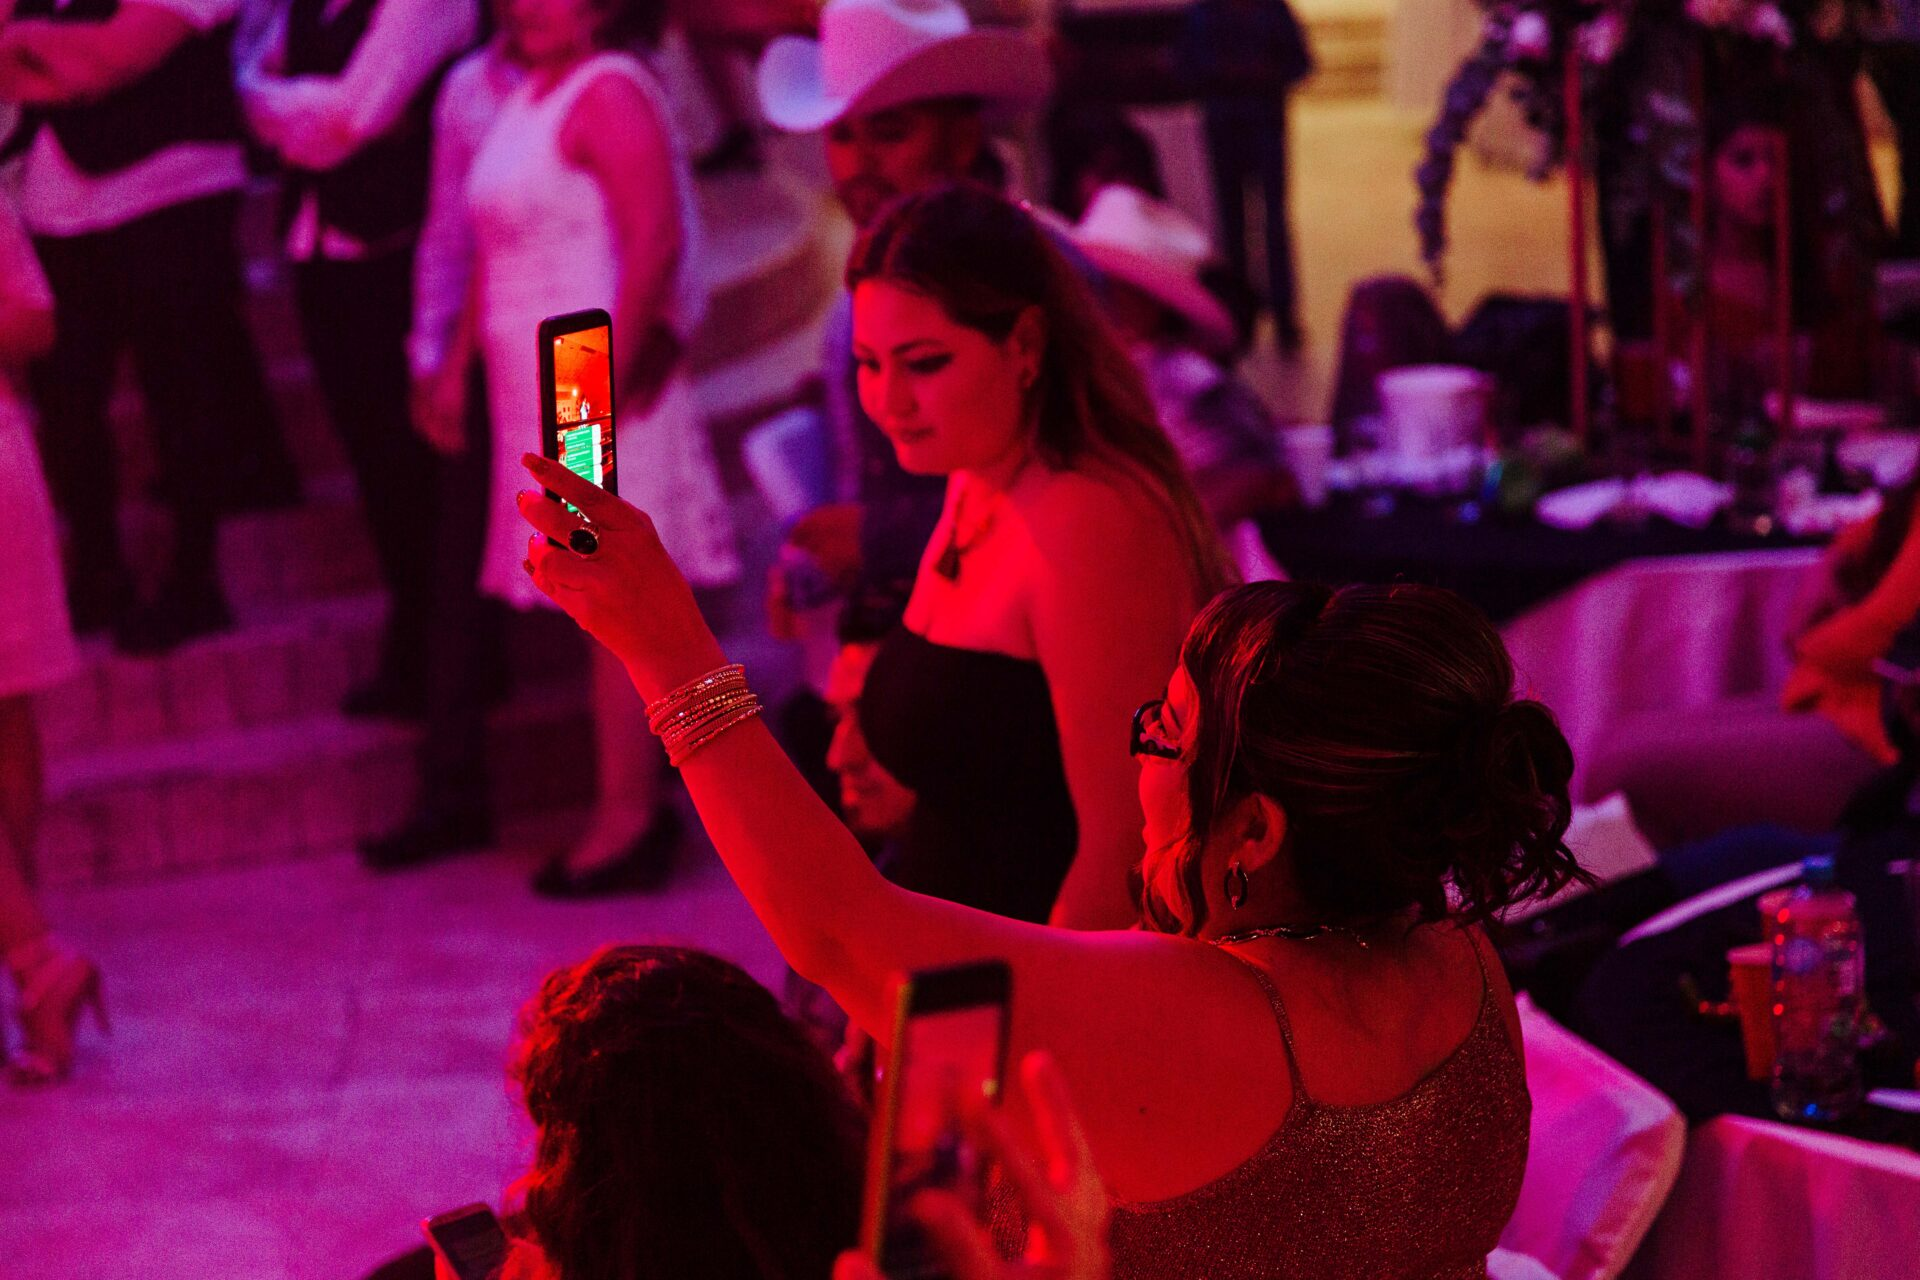 javier_noriega_fotografo_bodas_zacatecas_fresnillo_chihuahua_wedding_photographer27c